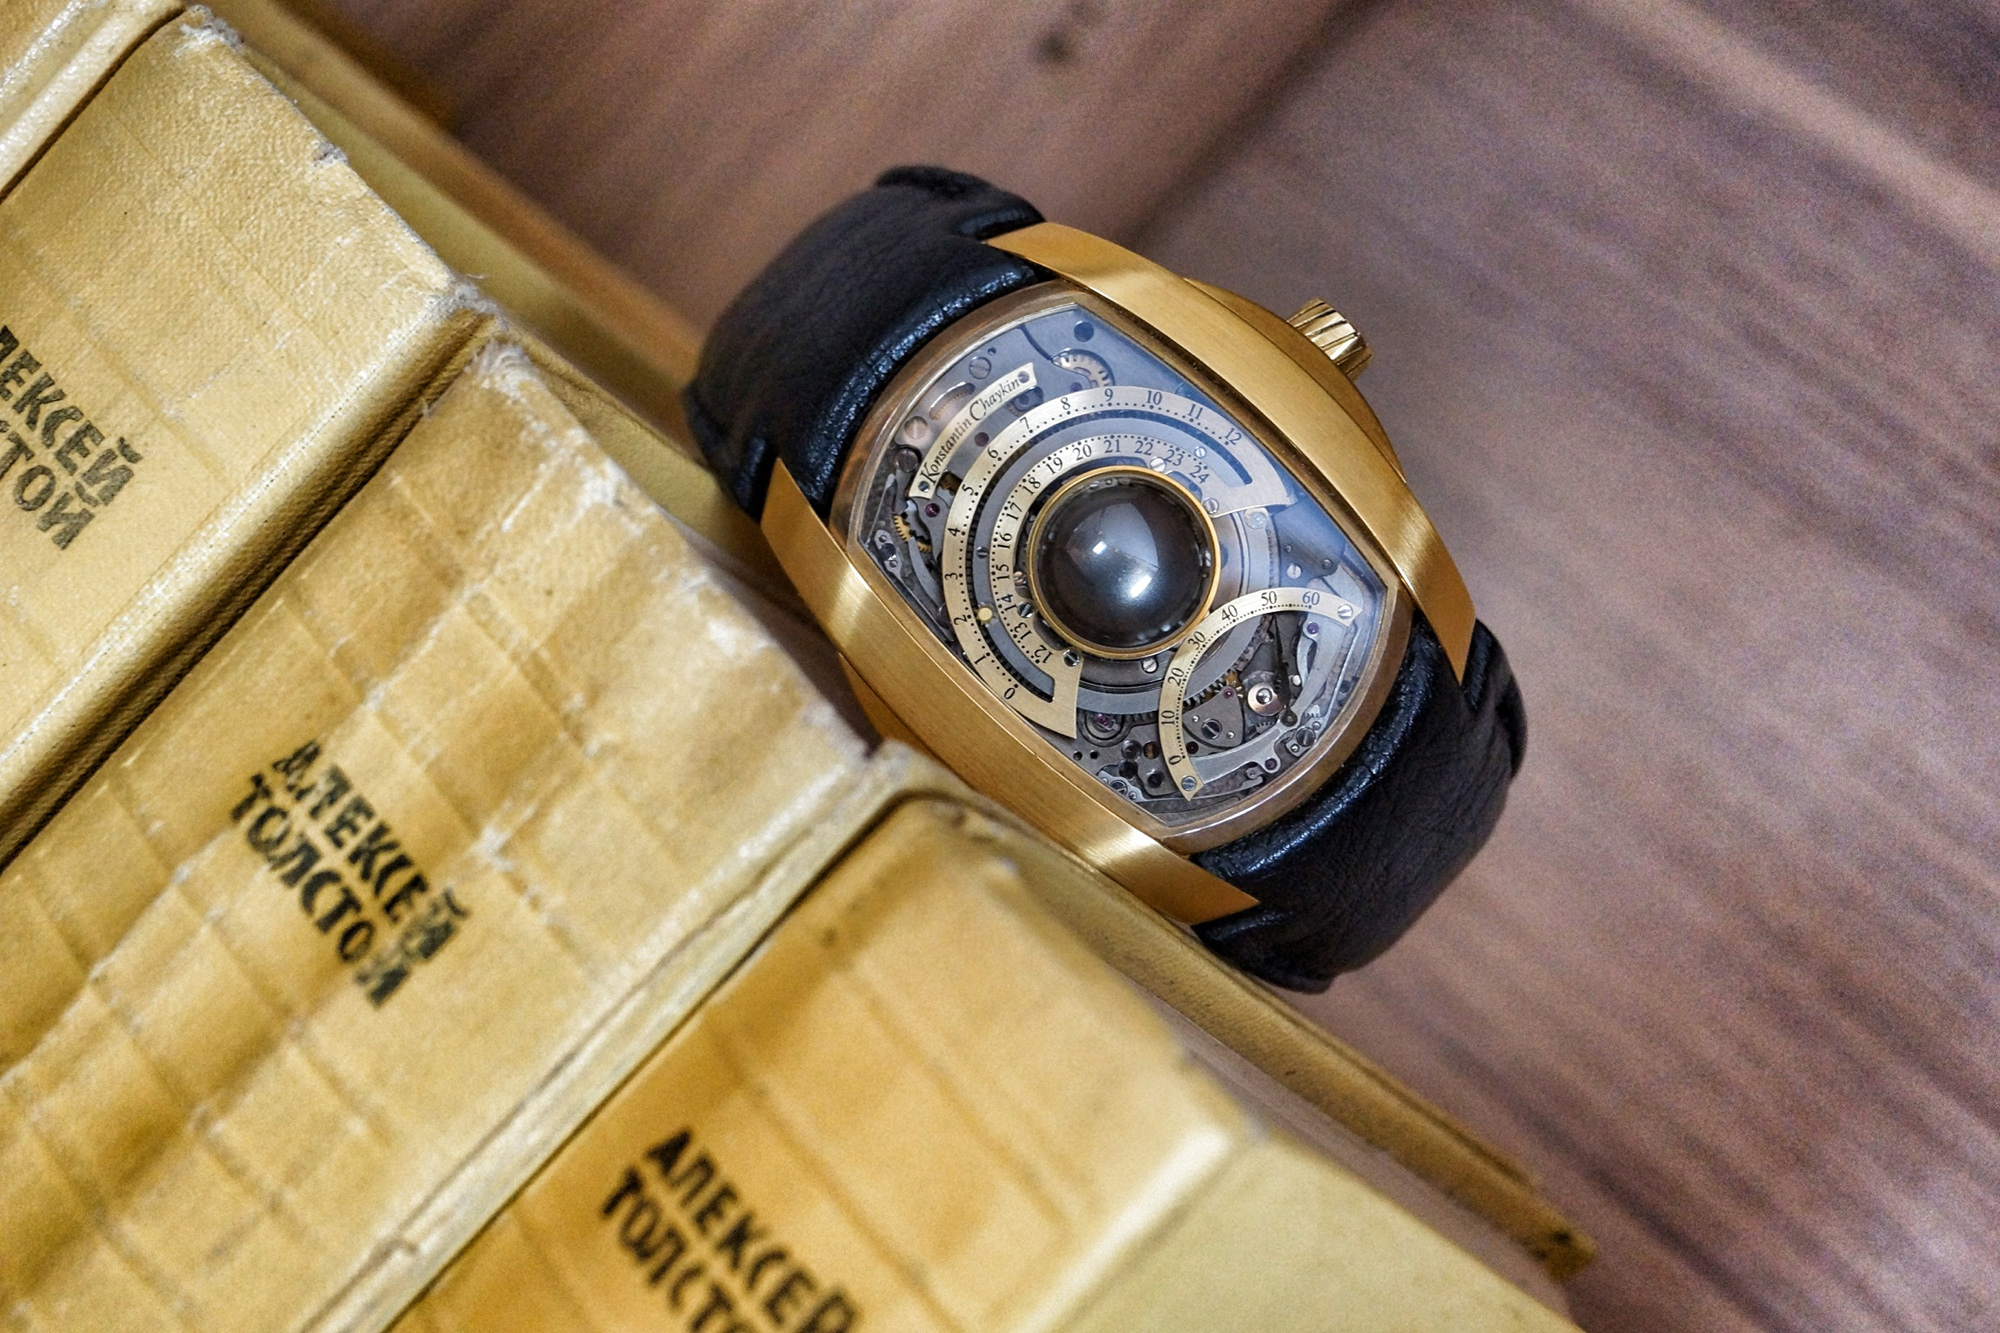 lunokhod-prime-01.jpg